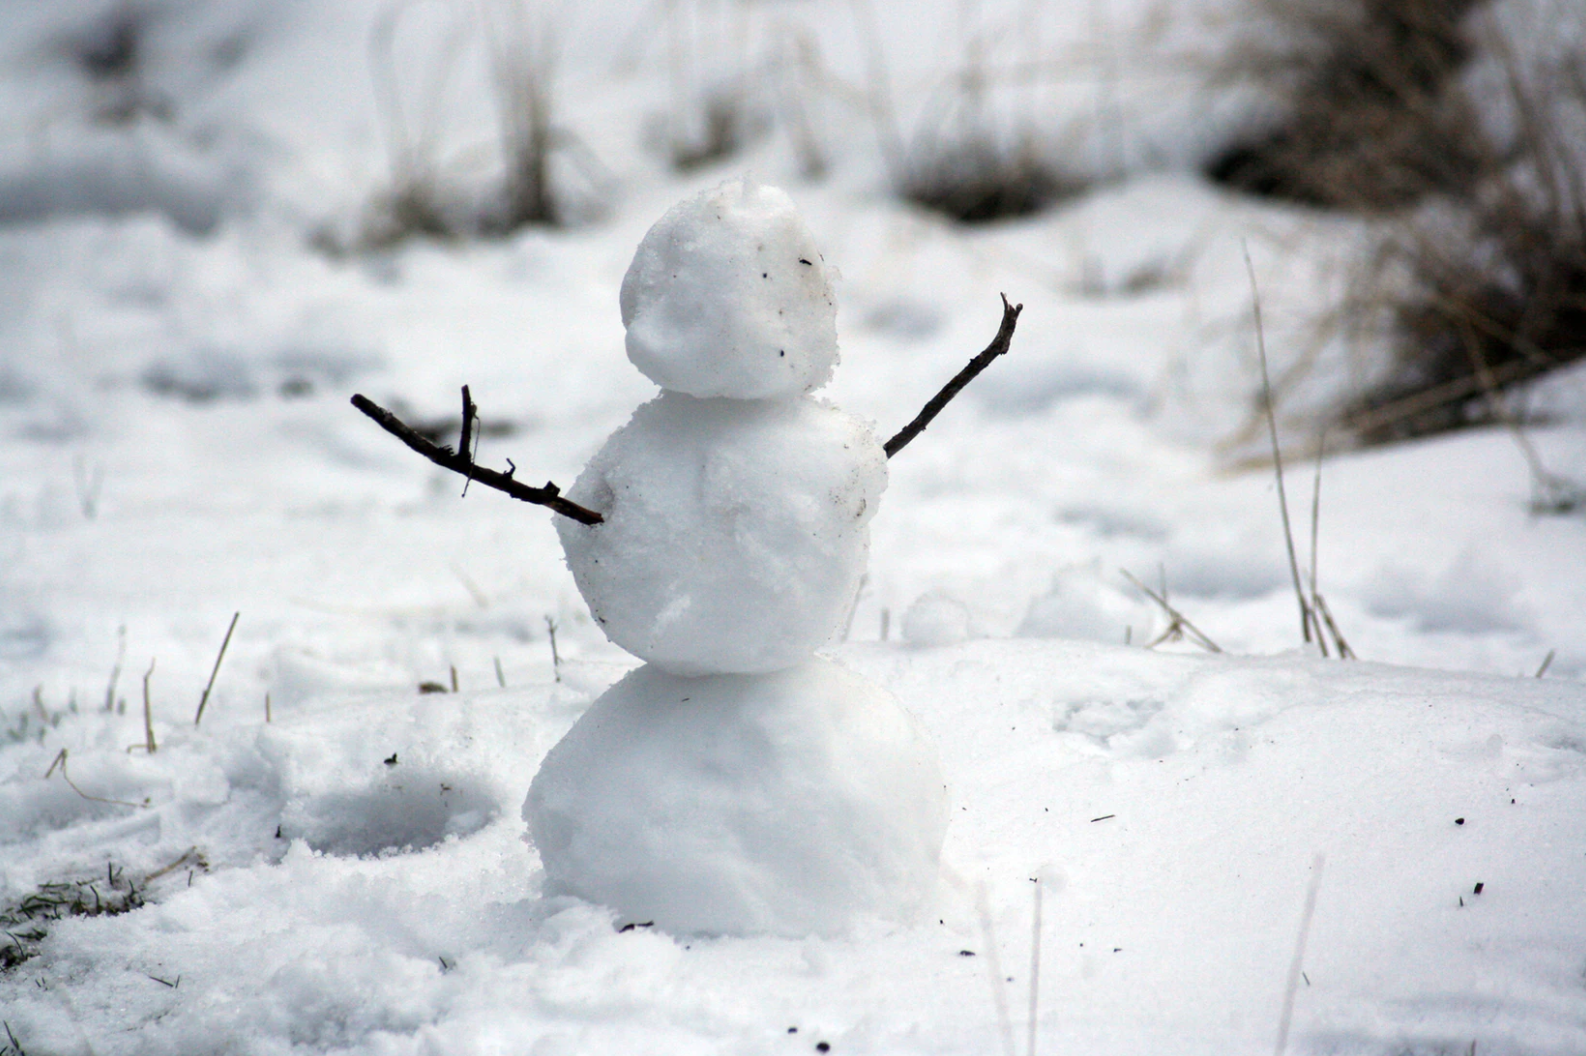 Will Digital School Days Replace Snow Days?